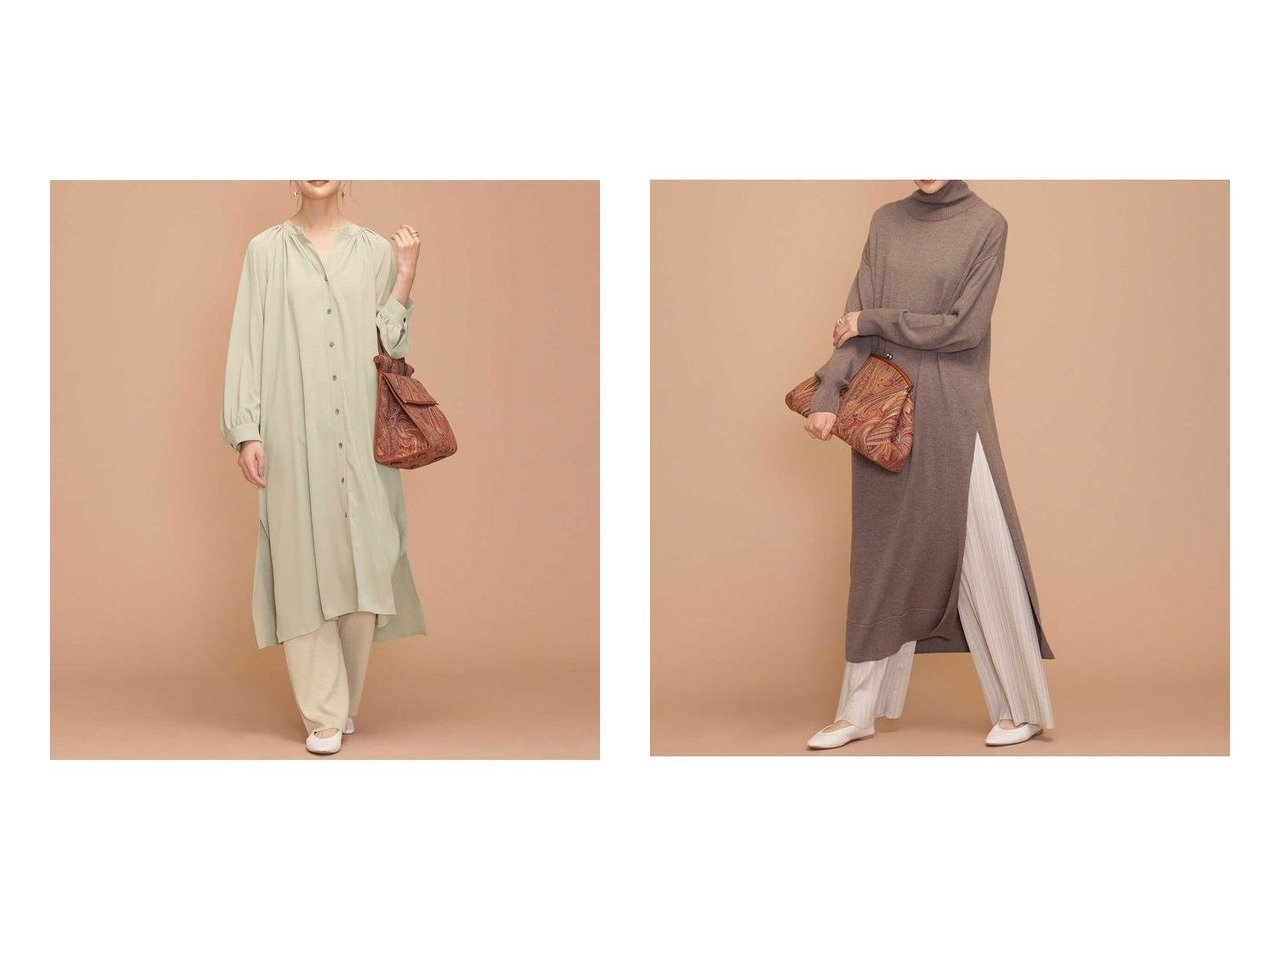 【nano universe/ナノ ユニバース】のジョーゼットワンピース×ニットパンツセット&ハイネックニットワンピース×プリーツパンツセット ワンピース・ドレスのおすすめ!人気、レディースファッションの通販  おすすめで人気のファッション通販商品 インテリア・家具・キッズファッション・メンズファッション・レディースファッション・服の通販 founy(ファニー) https://founy.com/ ファッション Fashion レディース WOMEN ワンピース Dress ニットワンピース Knit Dresses アクリル ウォッシャブル ギャザー シンプル ジョーゼット スキッパー スリット とろみ フロント リラックス |ID:crp329100000004282